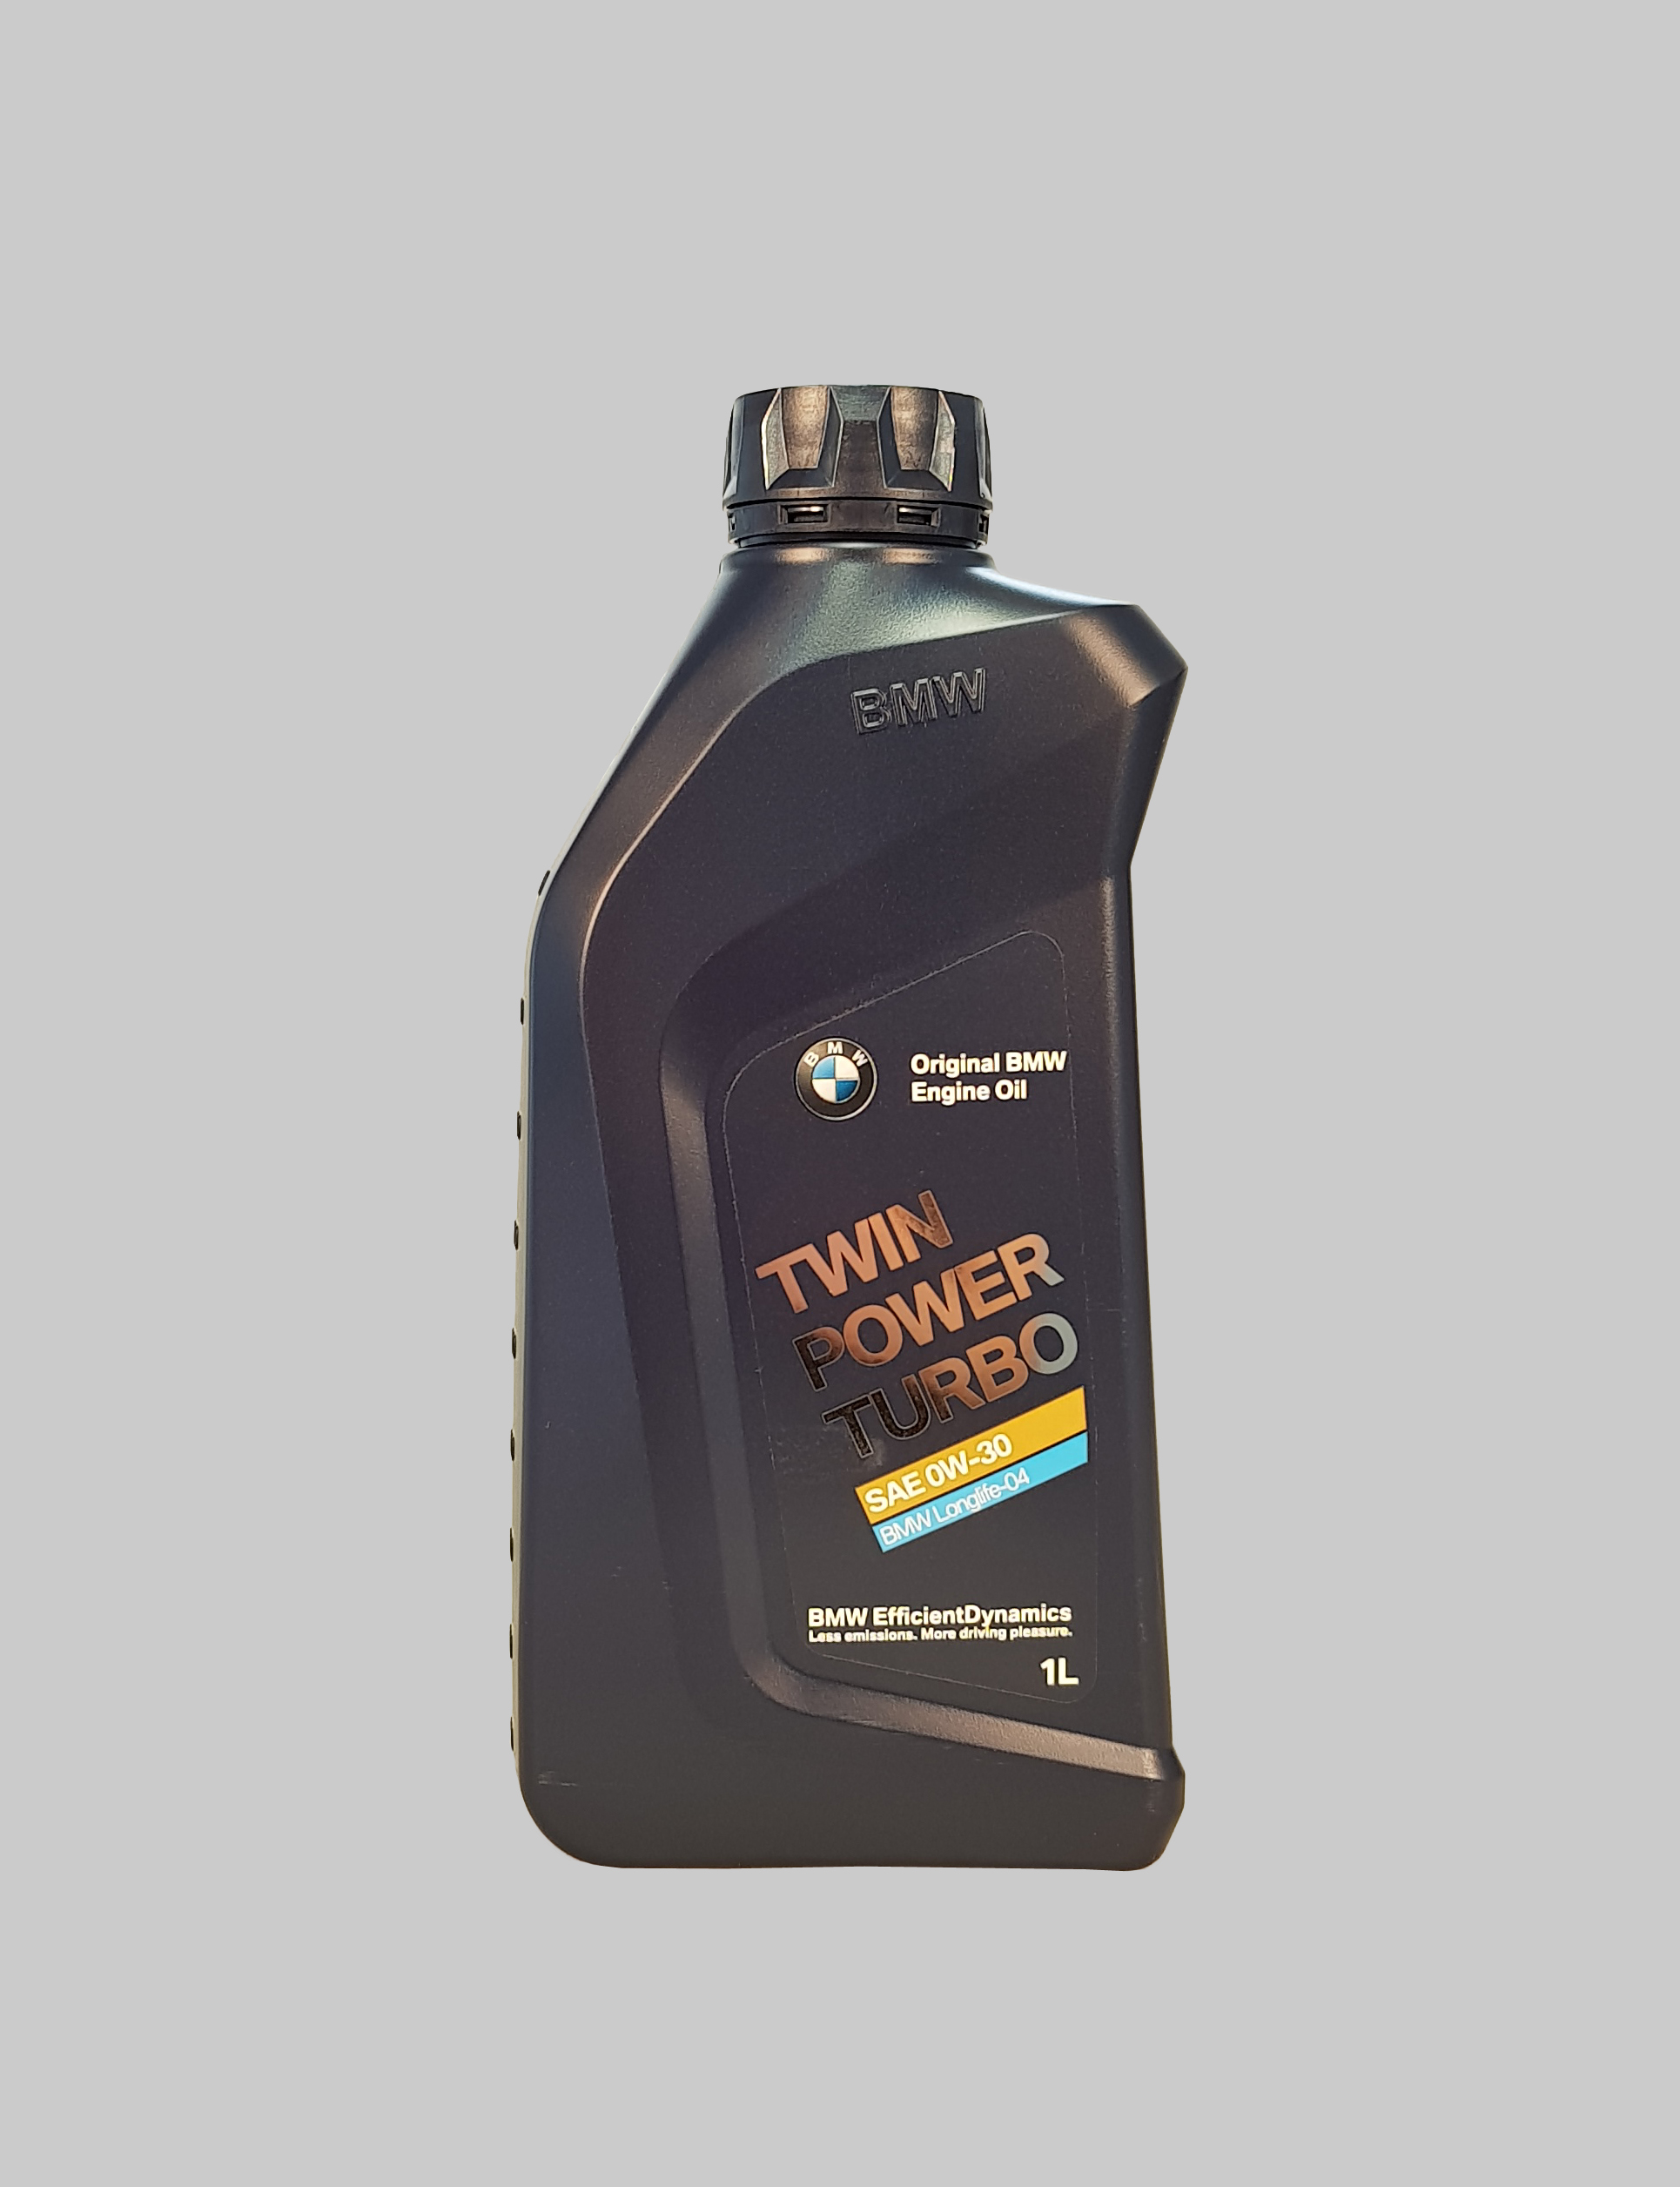 BMW TwinPower Turbo LL-04 0W-30 1 Liter